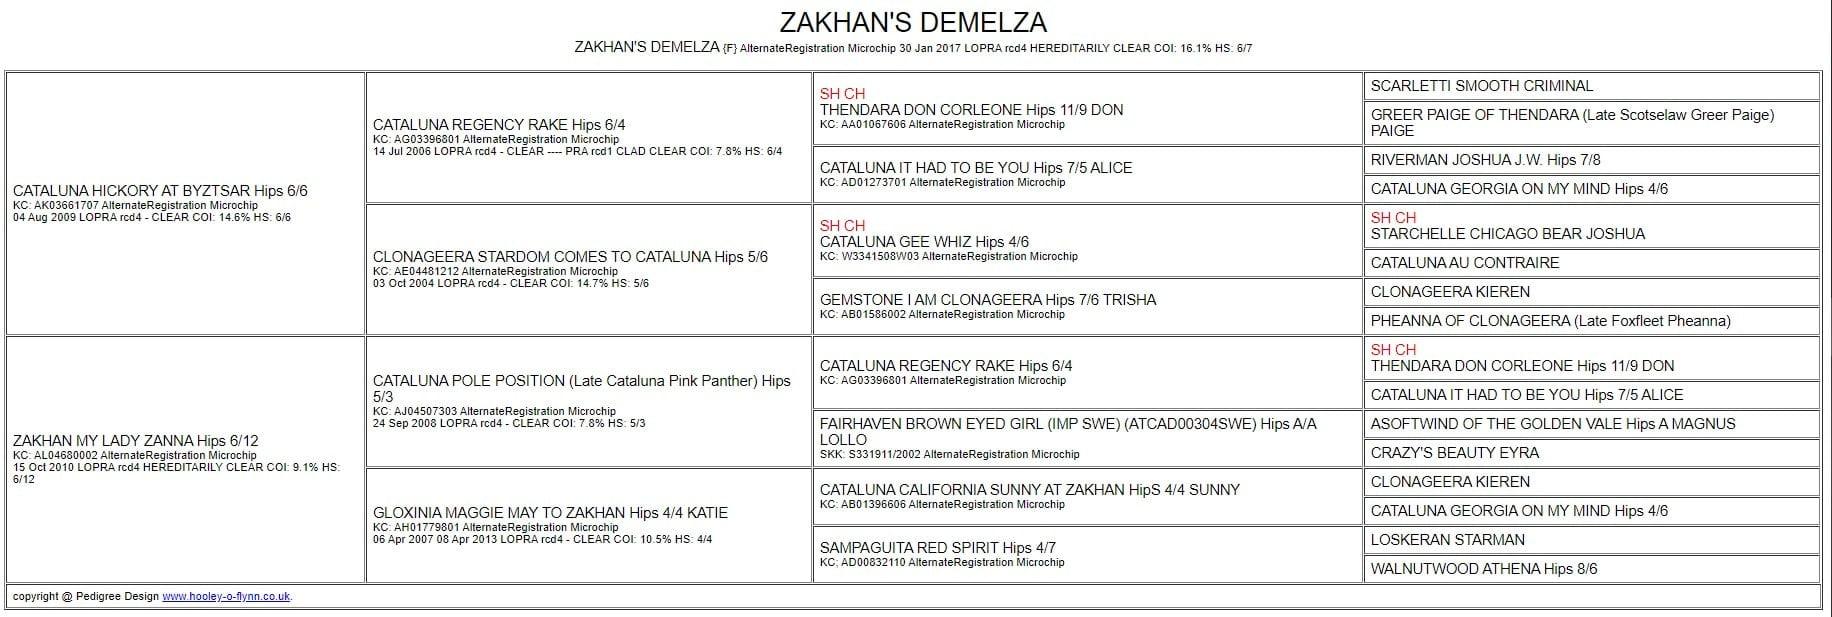 ZAKHANS DEMELZA